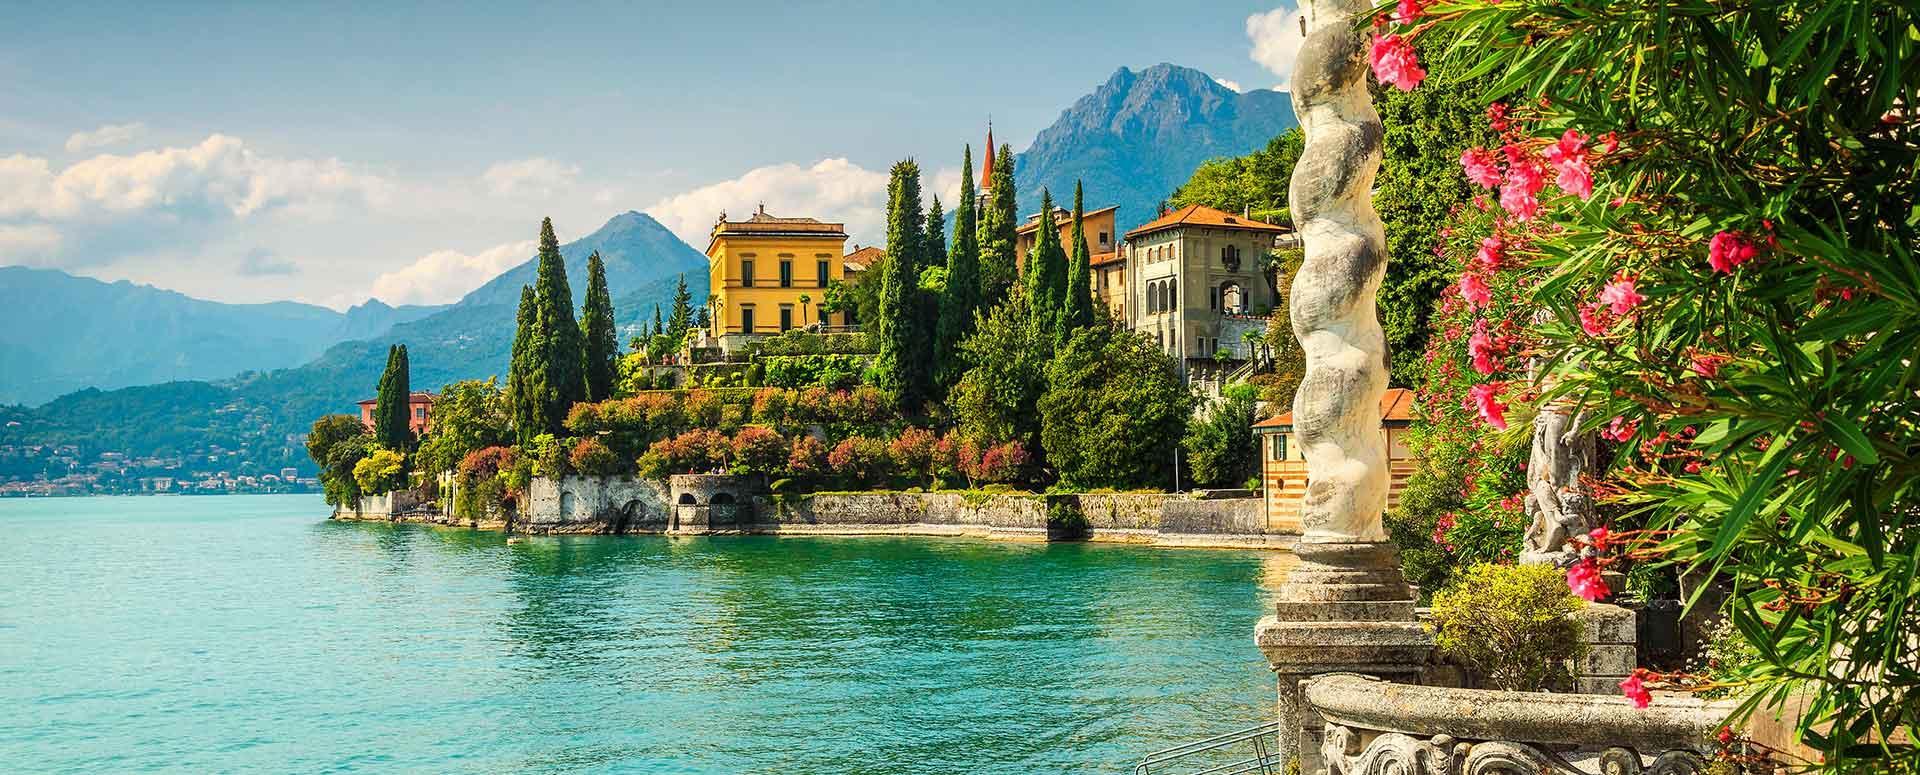 ITALIAN RIVIERA & LAKE COMO